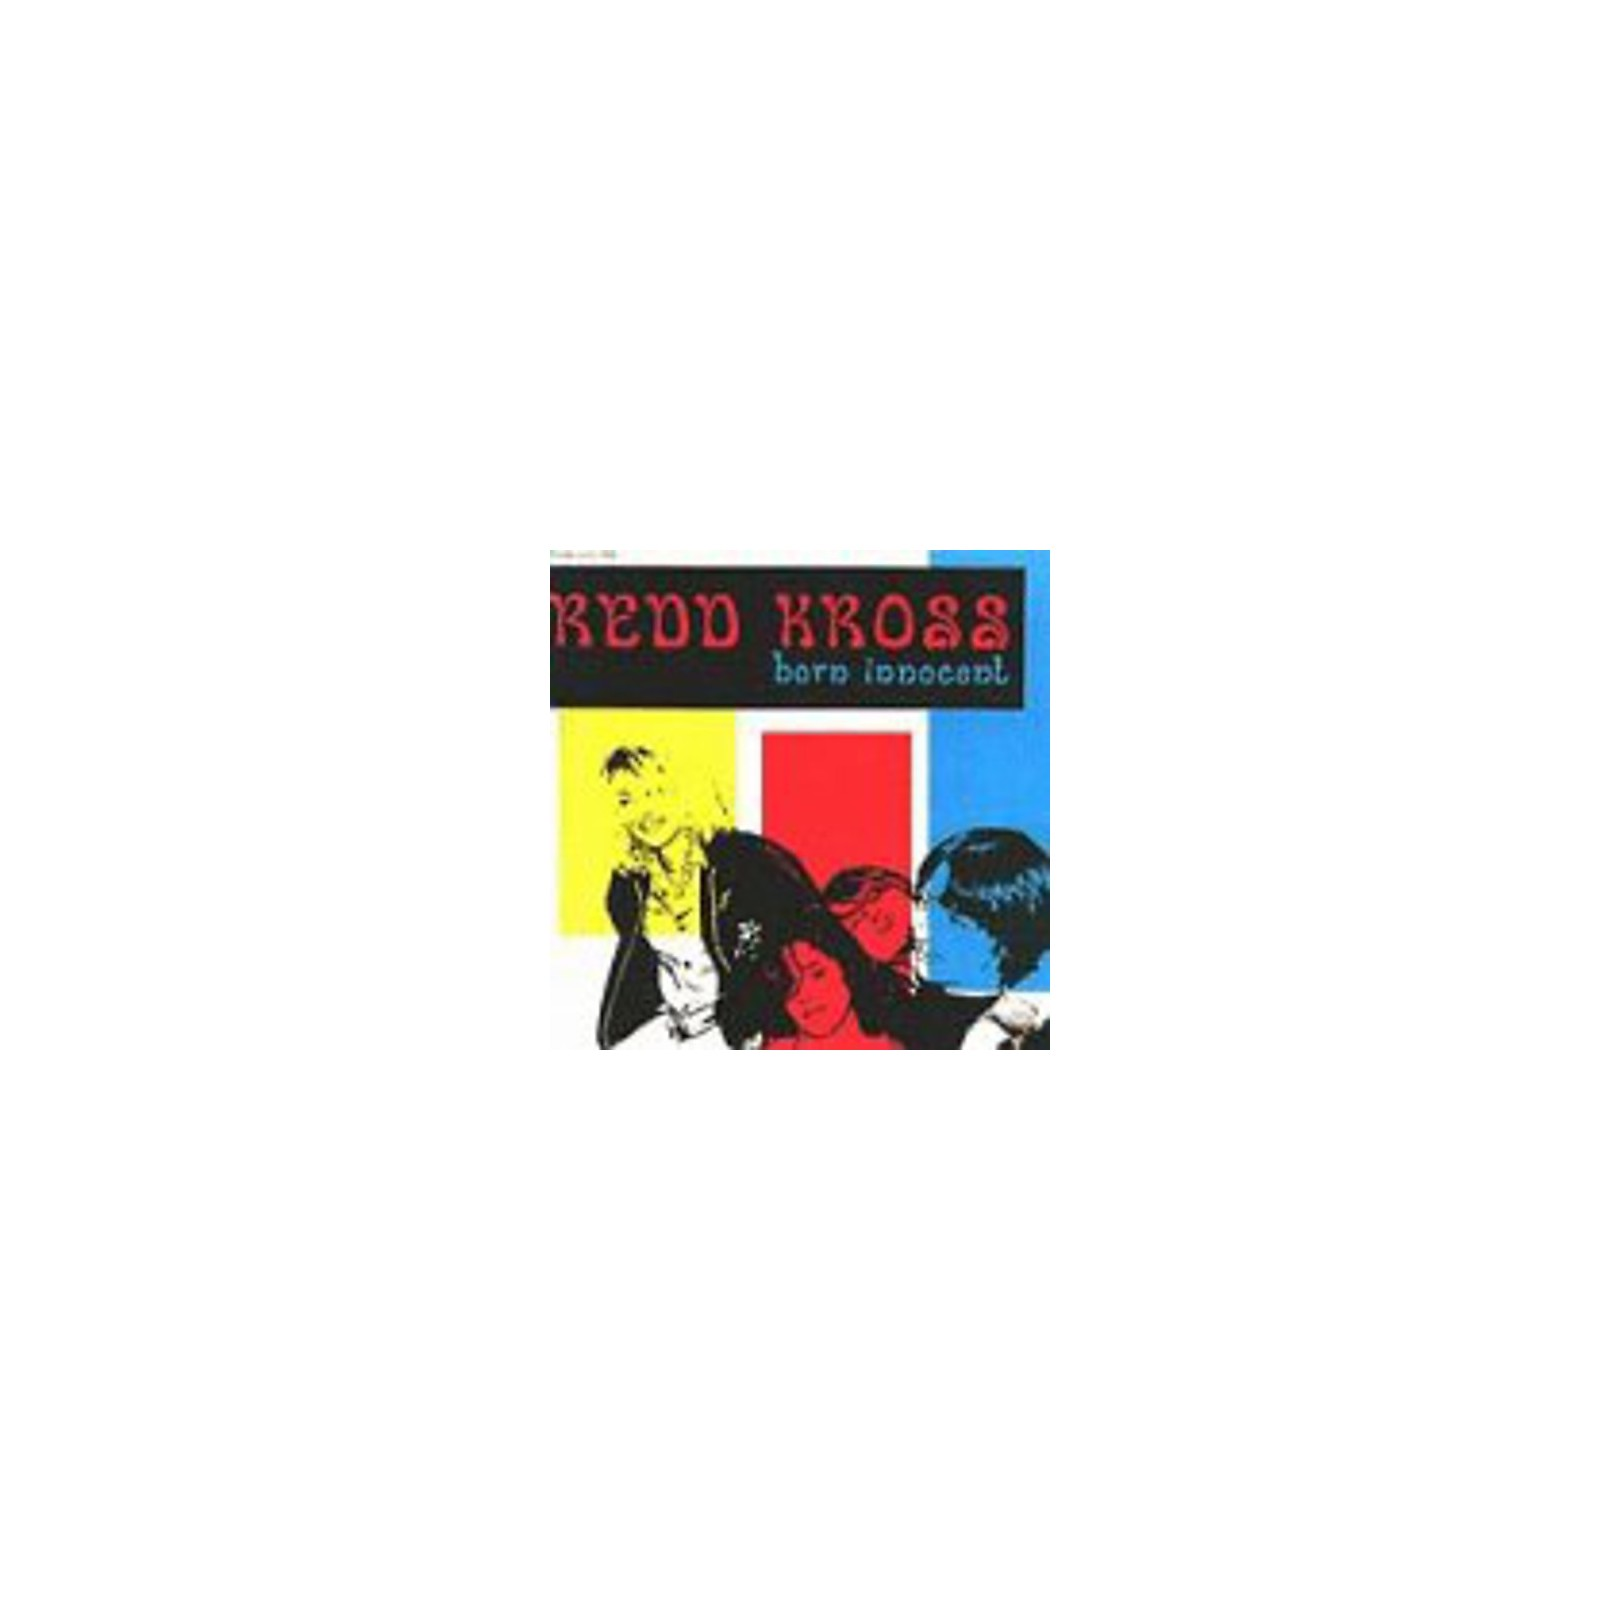 Alliance Redd Kross - Born Innocent